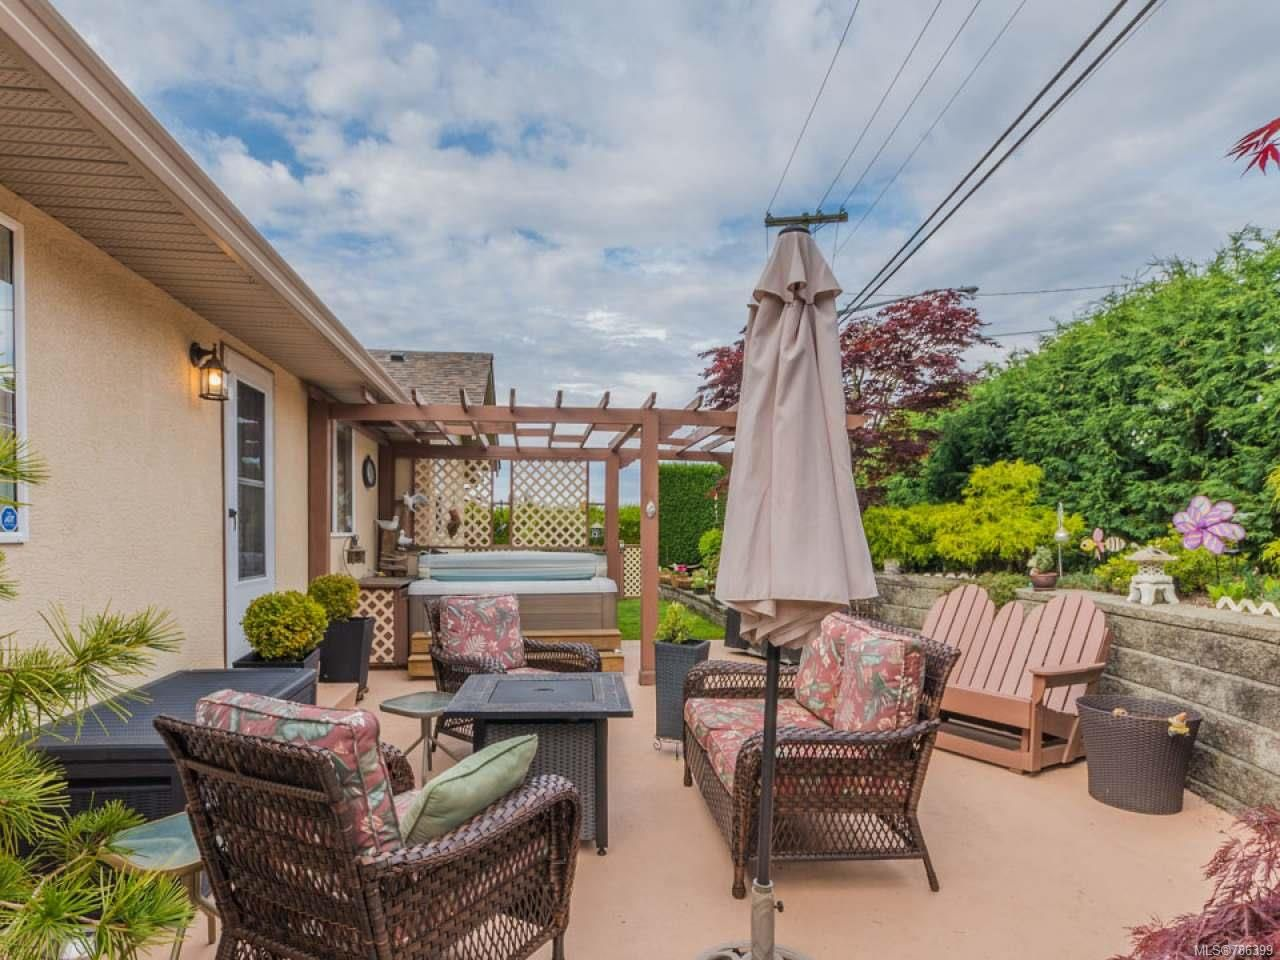 Photo 32: Photos: 5371 HIGHRIDGE PLACE in NANAIMO: Na North Nanaimo House for sale (Nanaimo)  : MLS®# 786399